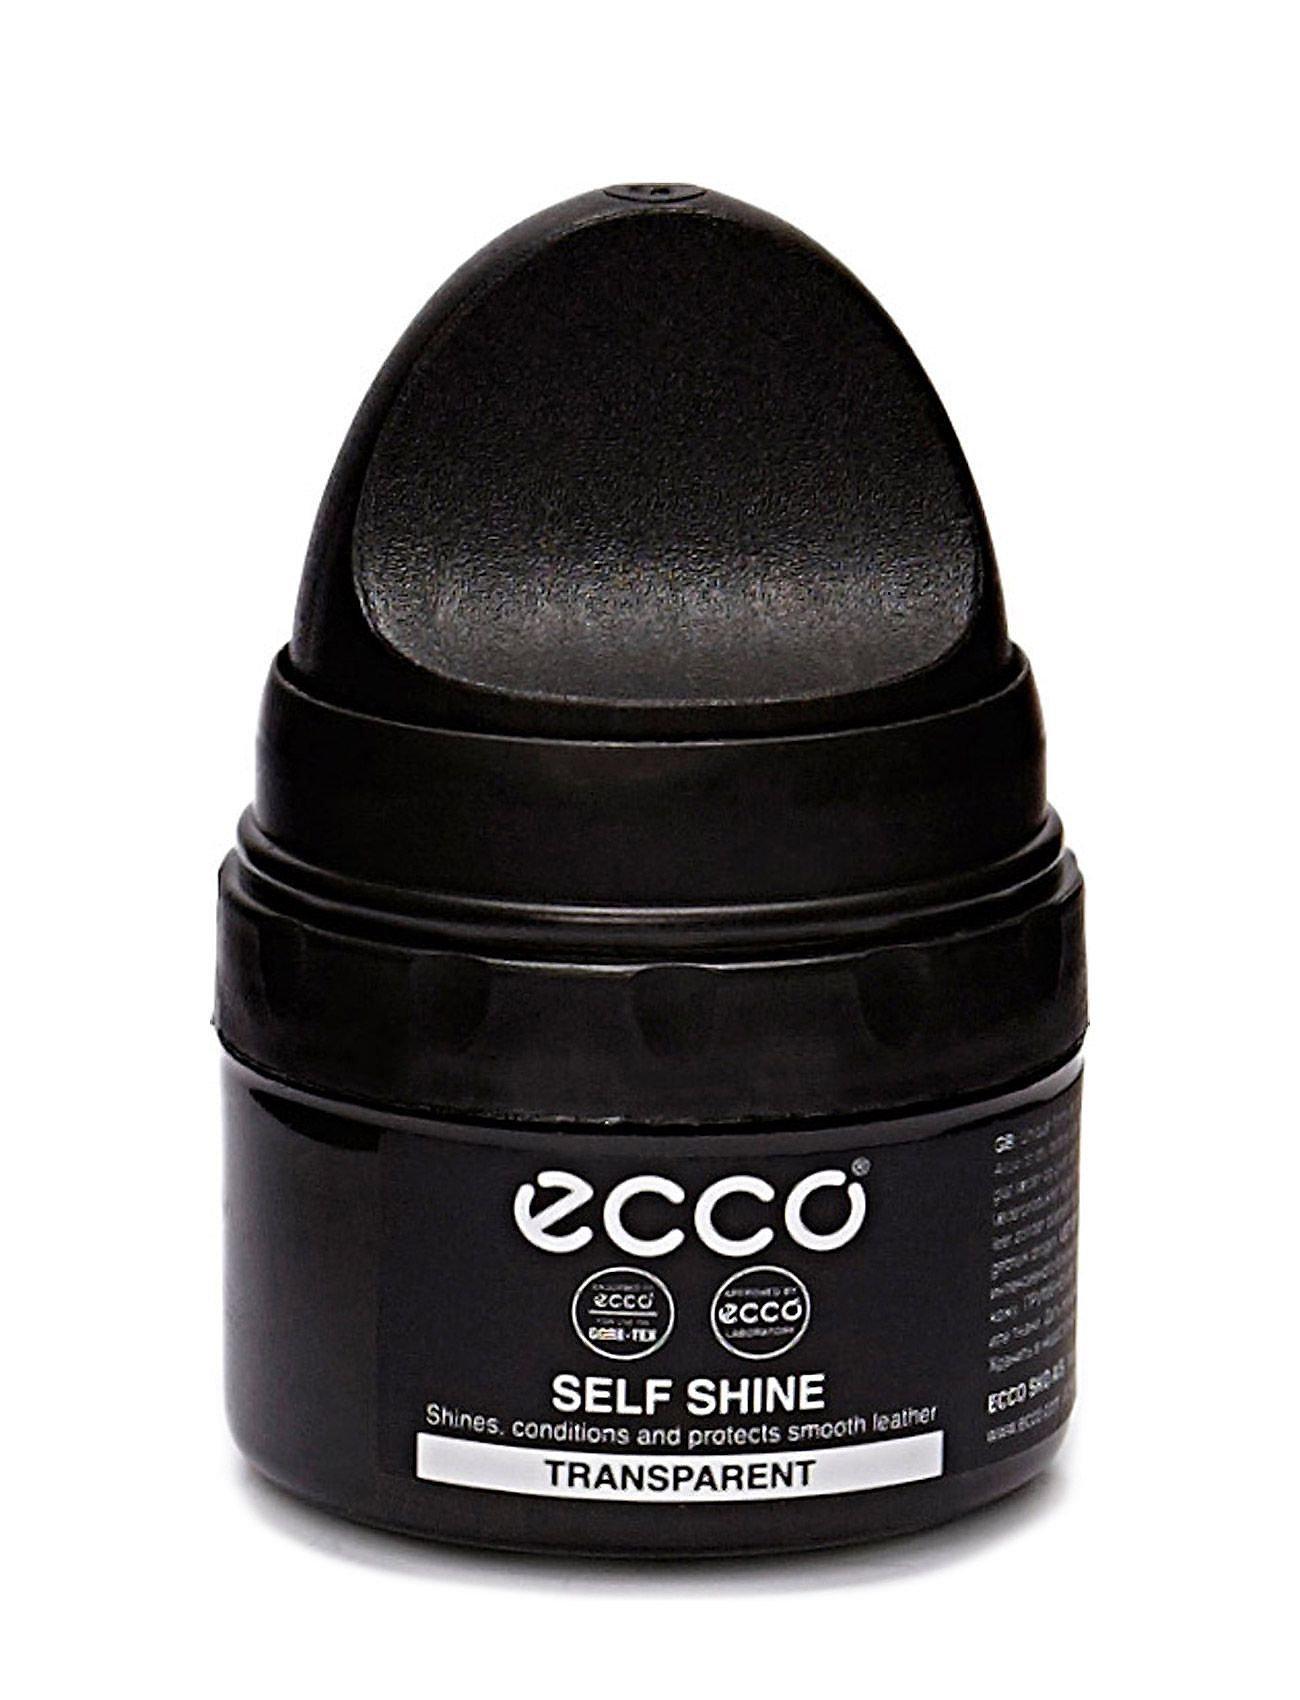 Image of Shoe Care Care Smykke ECCO (3181145301)